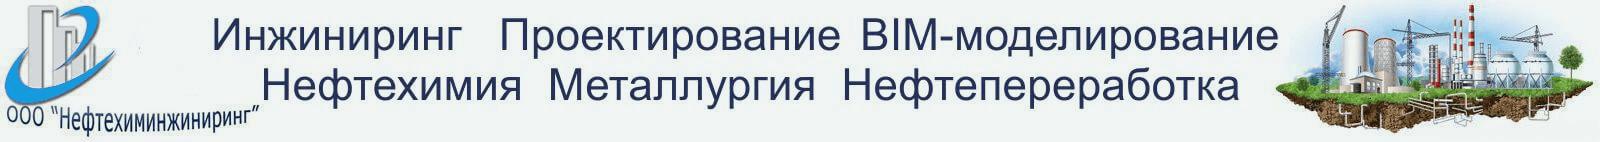 ООО «Нефтехиминжиниринг»